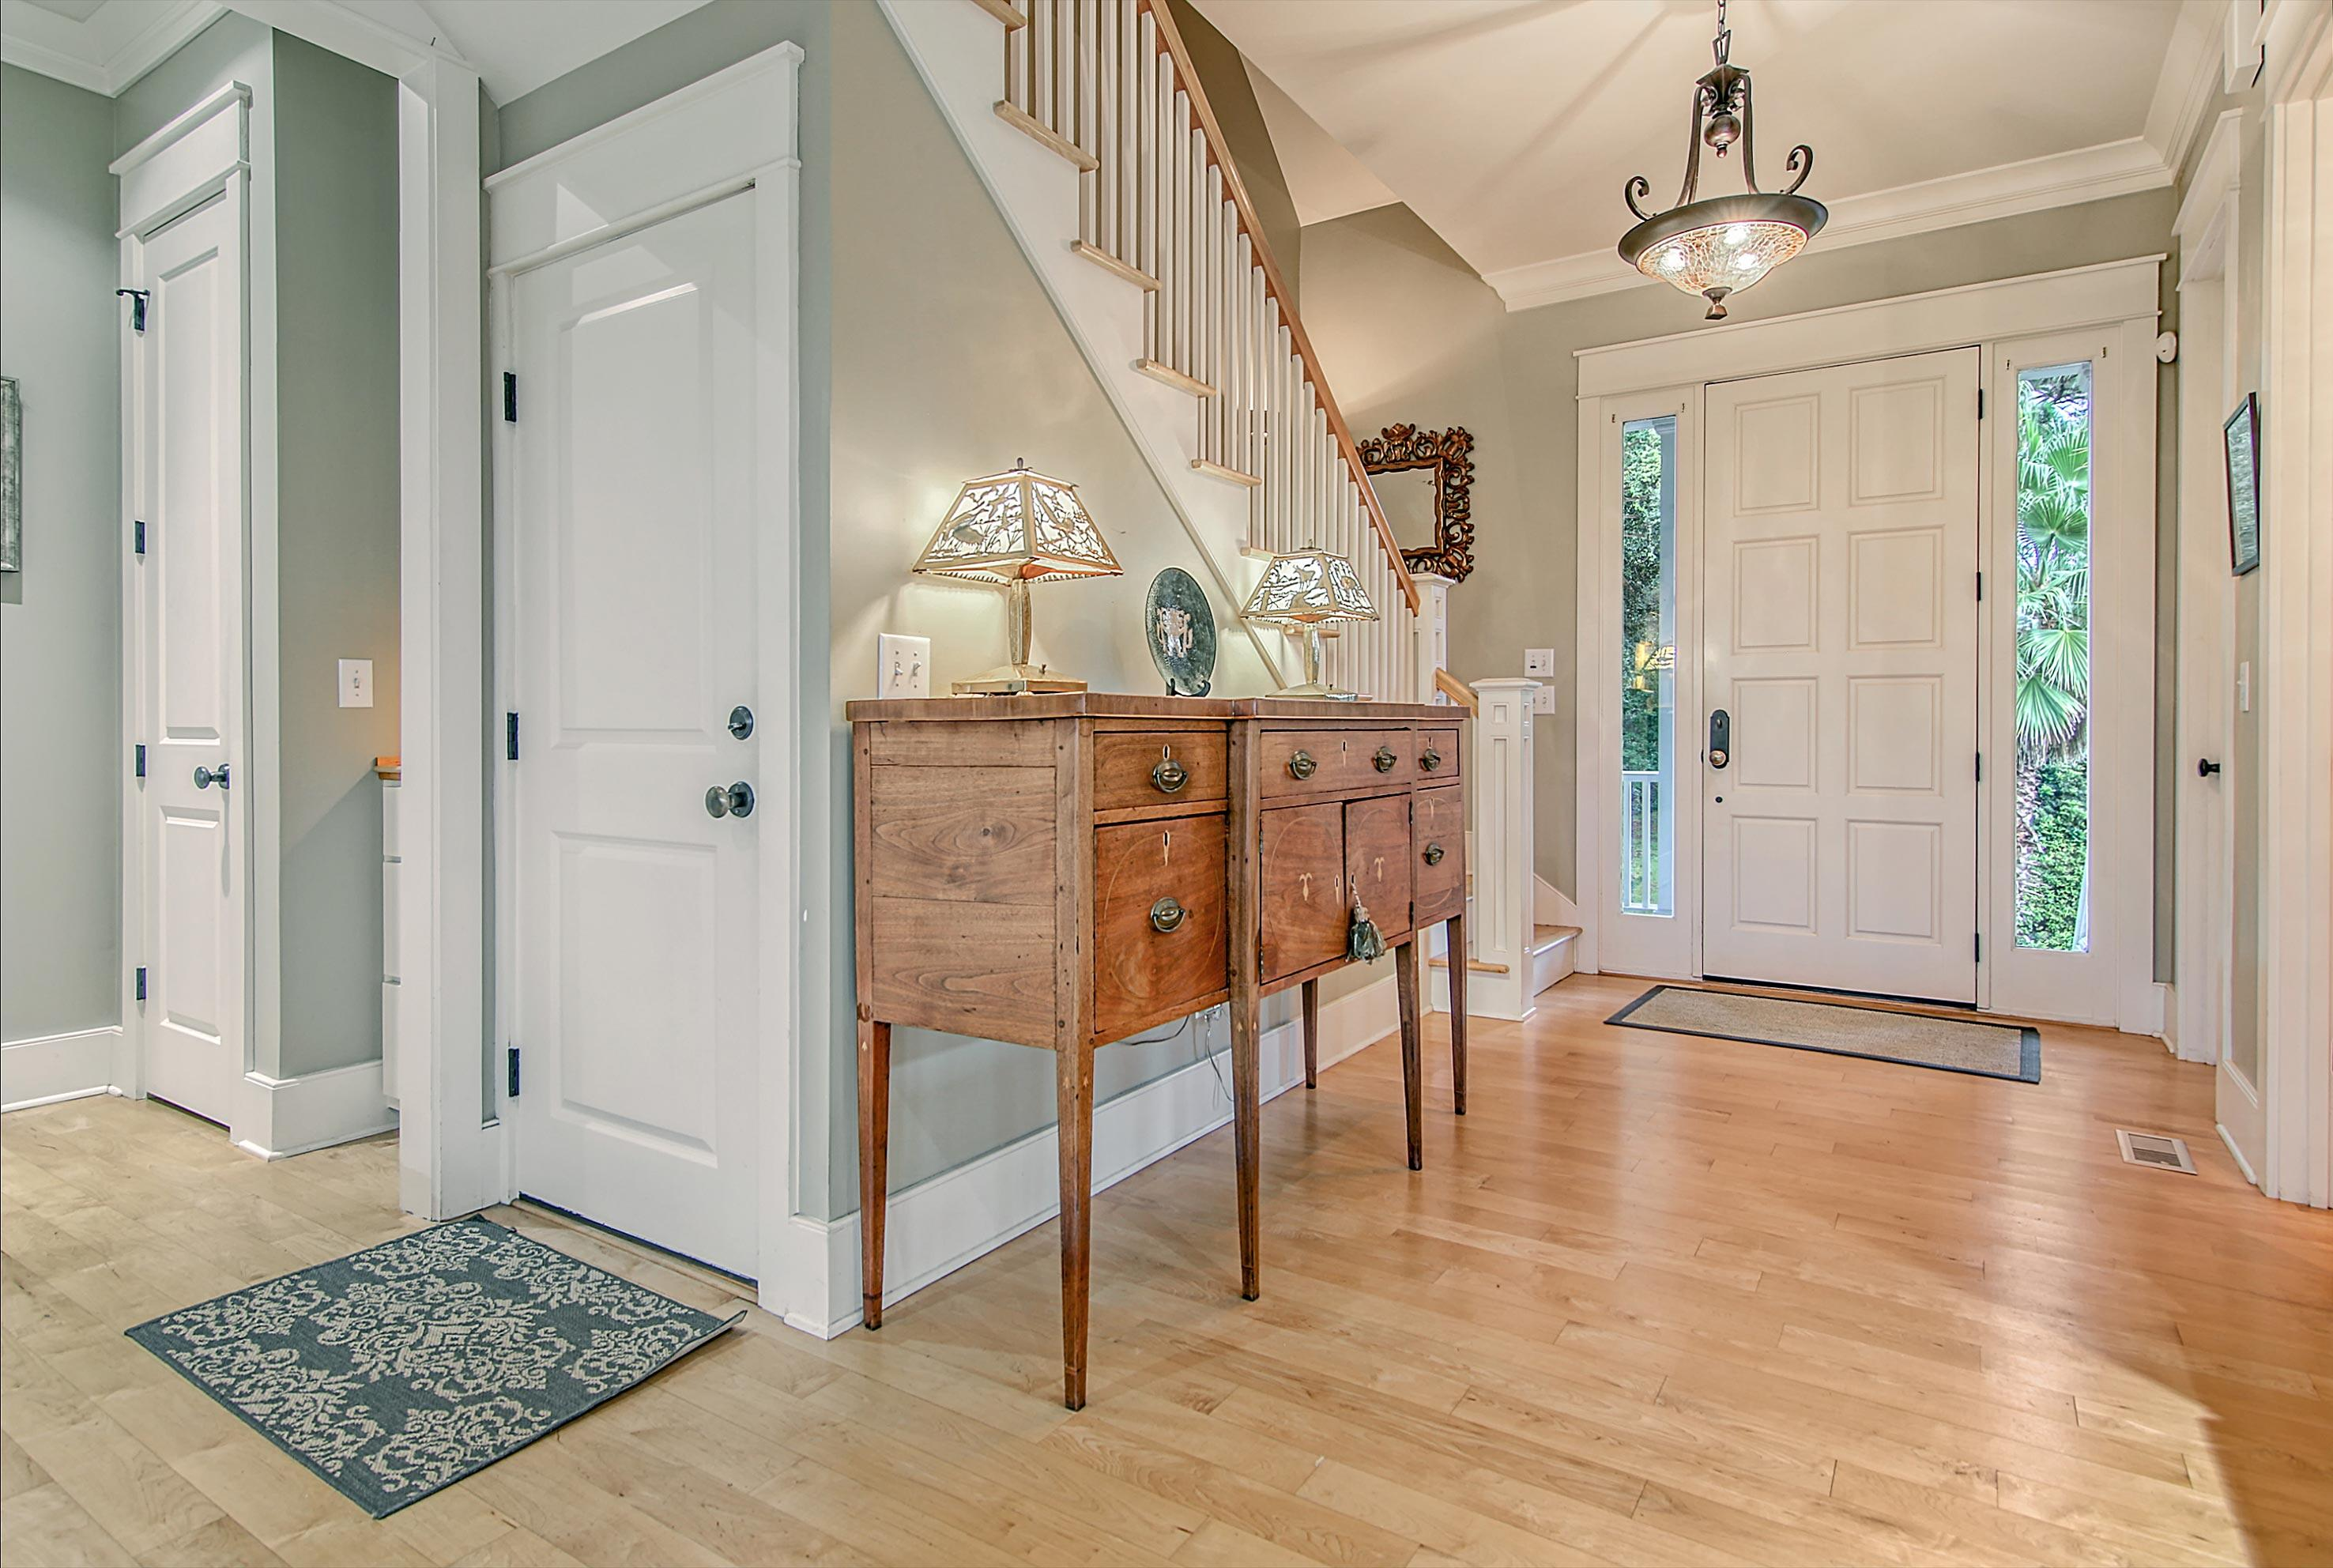 Scanlonville Homes For Sale - 152 6th, Mount Pleasant, SC - 14